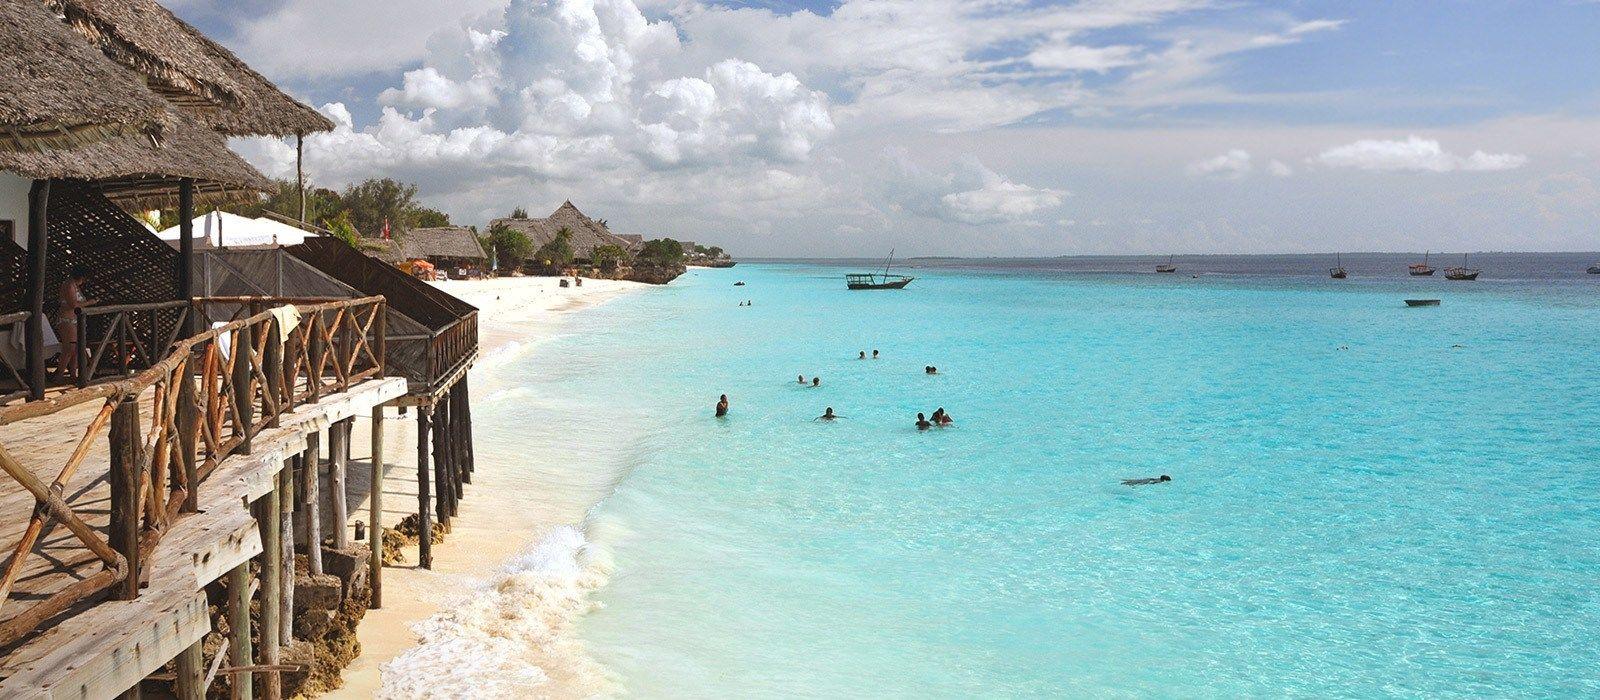 Classic Tanzania and Zanzibar Tour Trip 5